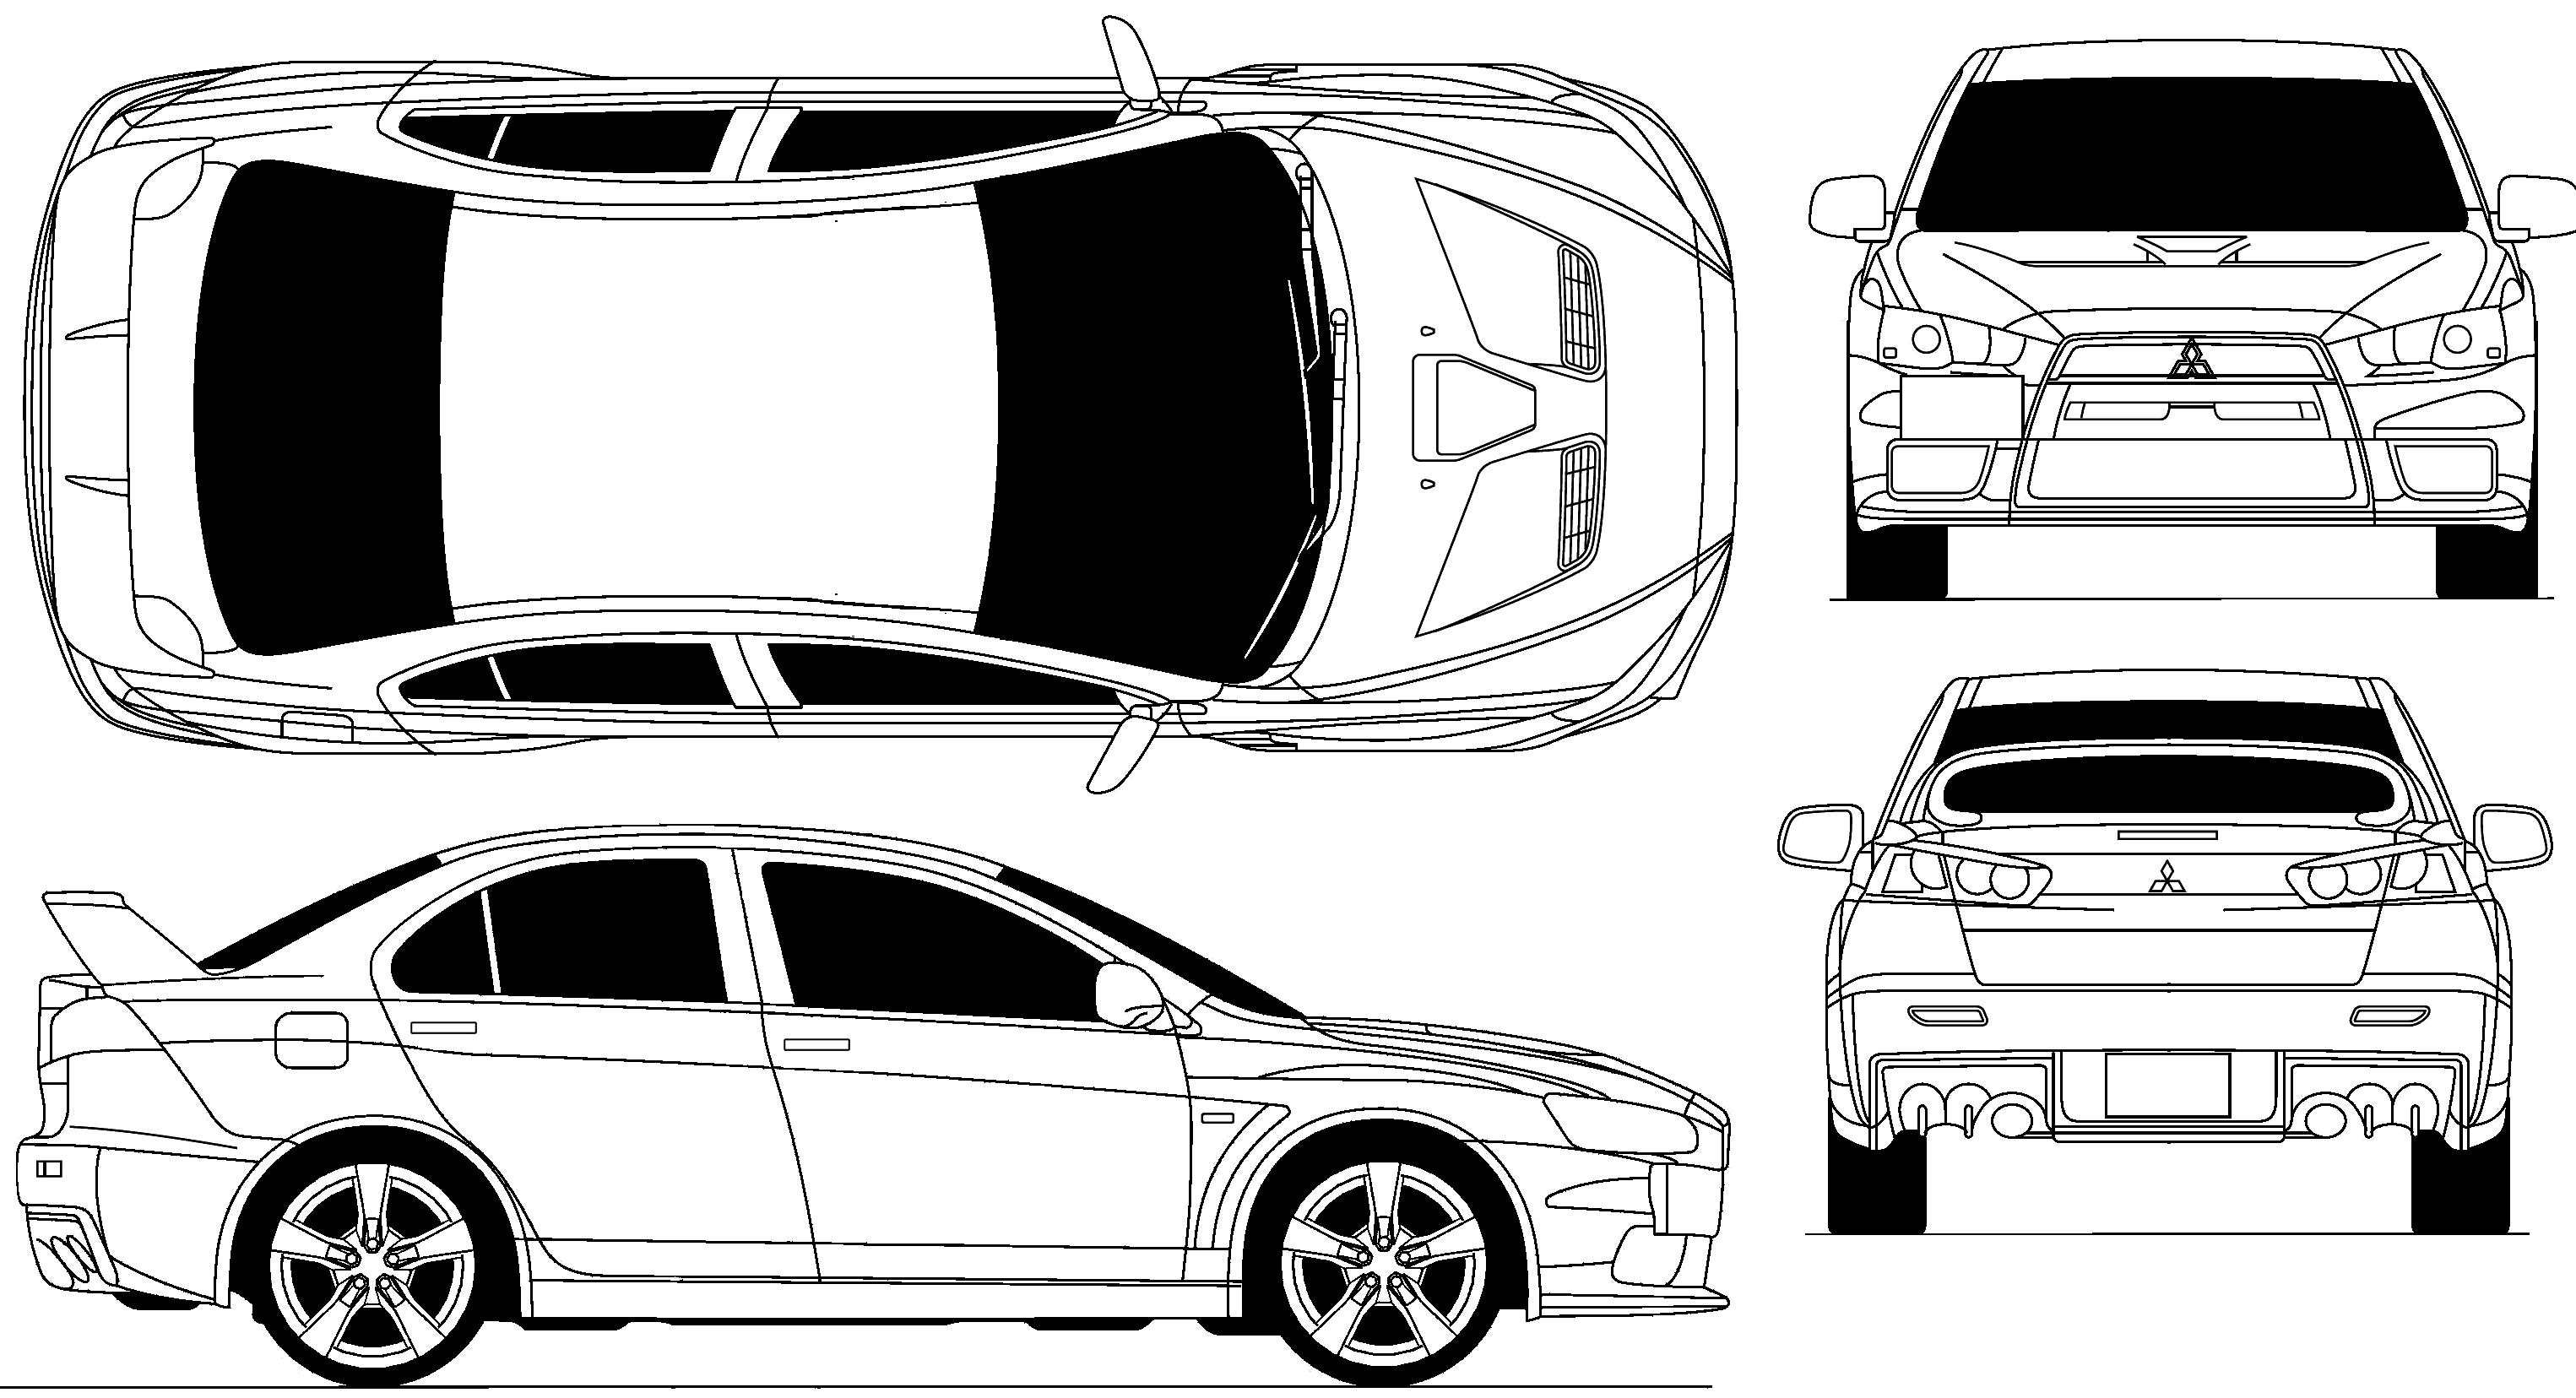 2009 Mitsubishi Lancer Evolution X Sedan blueprints free - Outlines